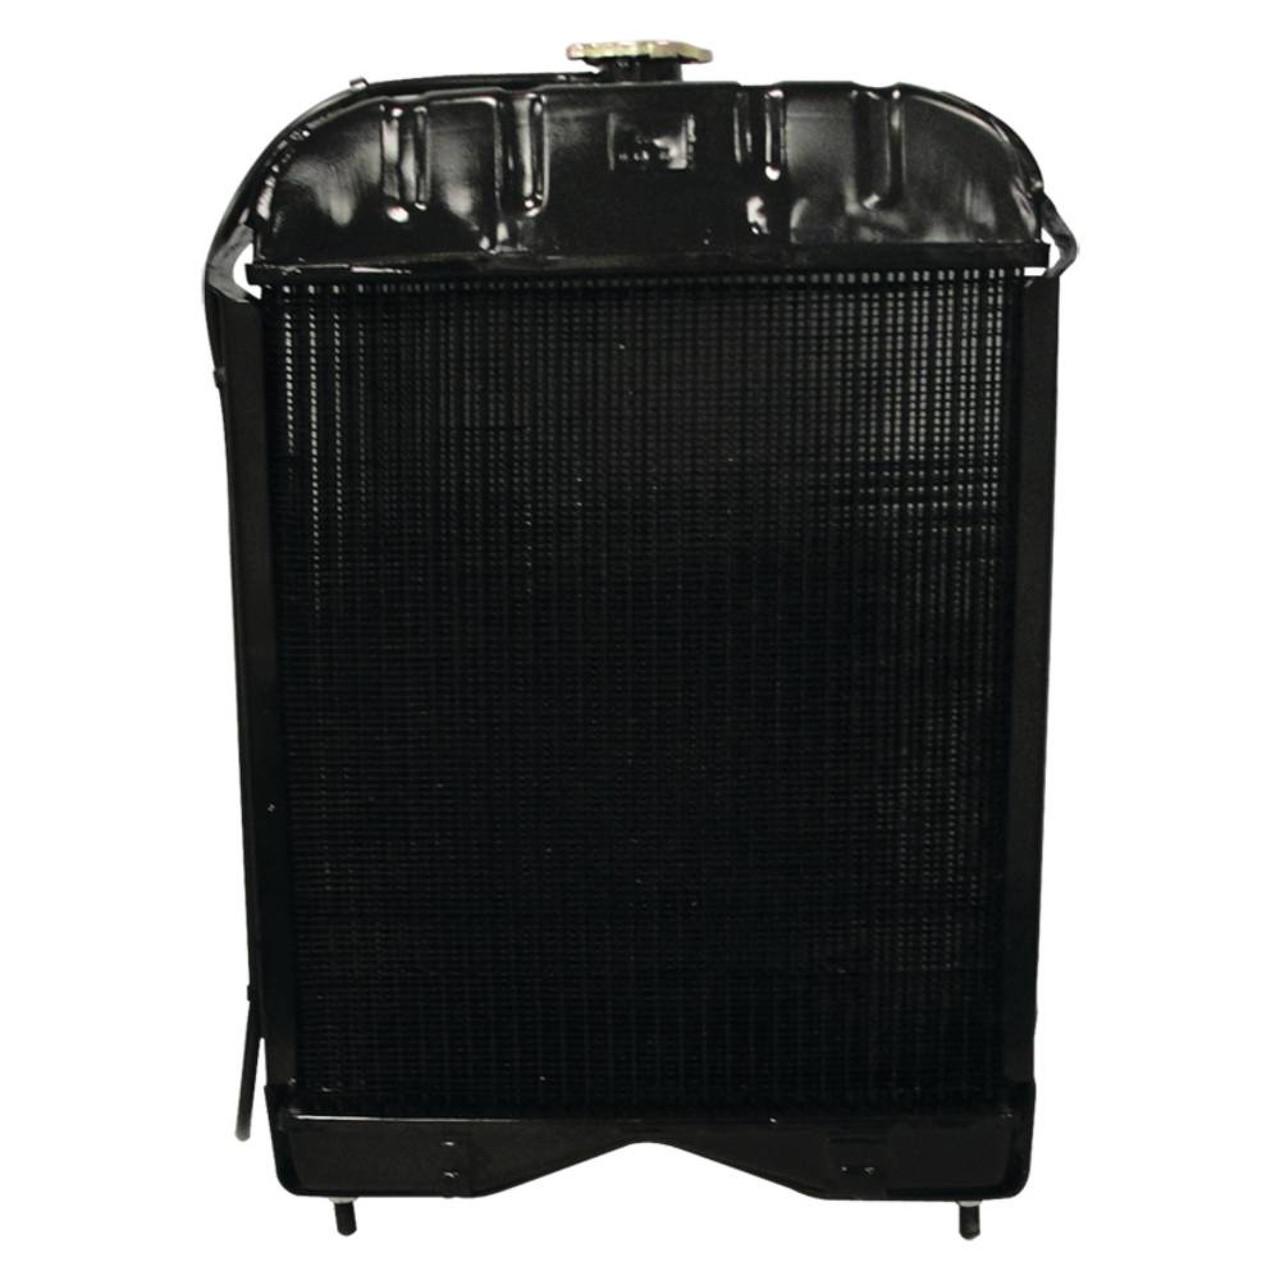 Massey Ferguson radiator